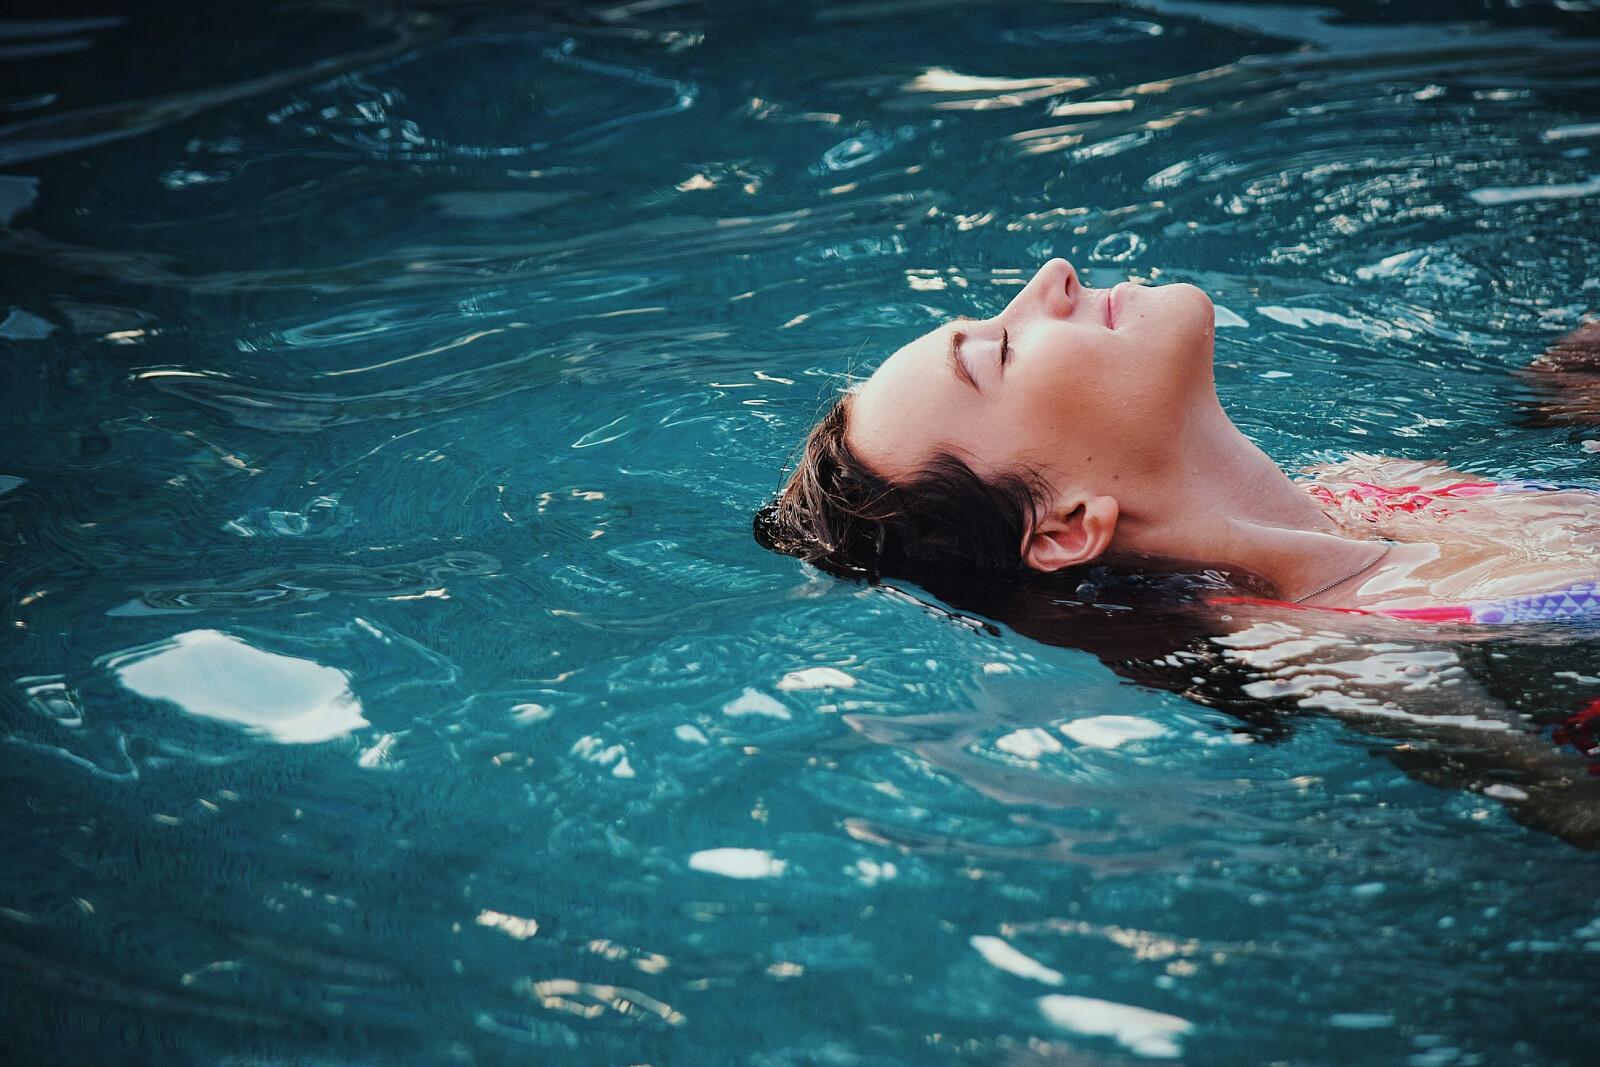 fot. Haley Phelps / Unsplash